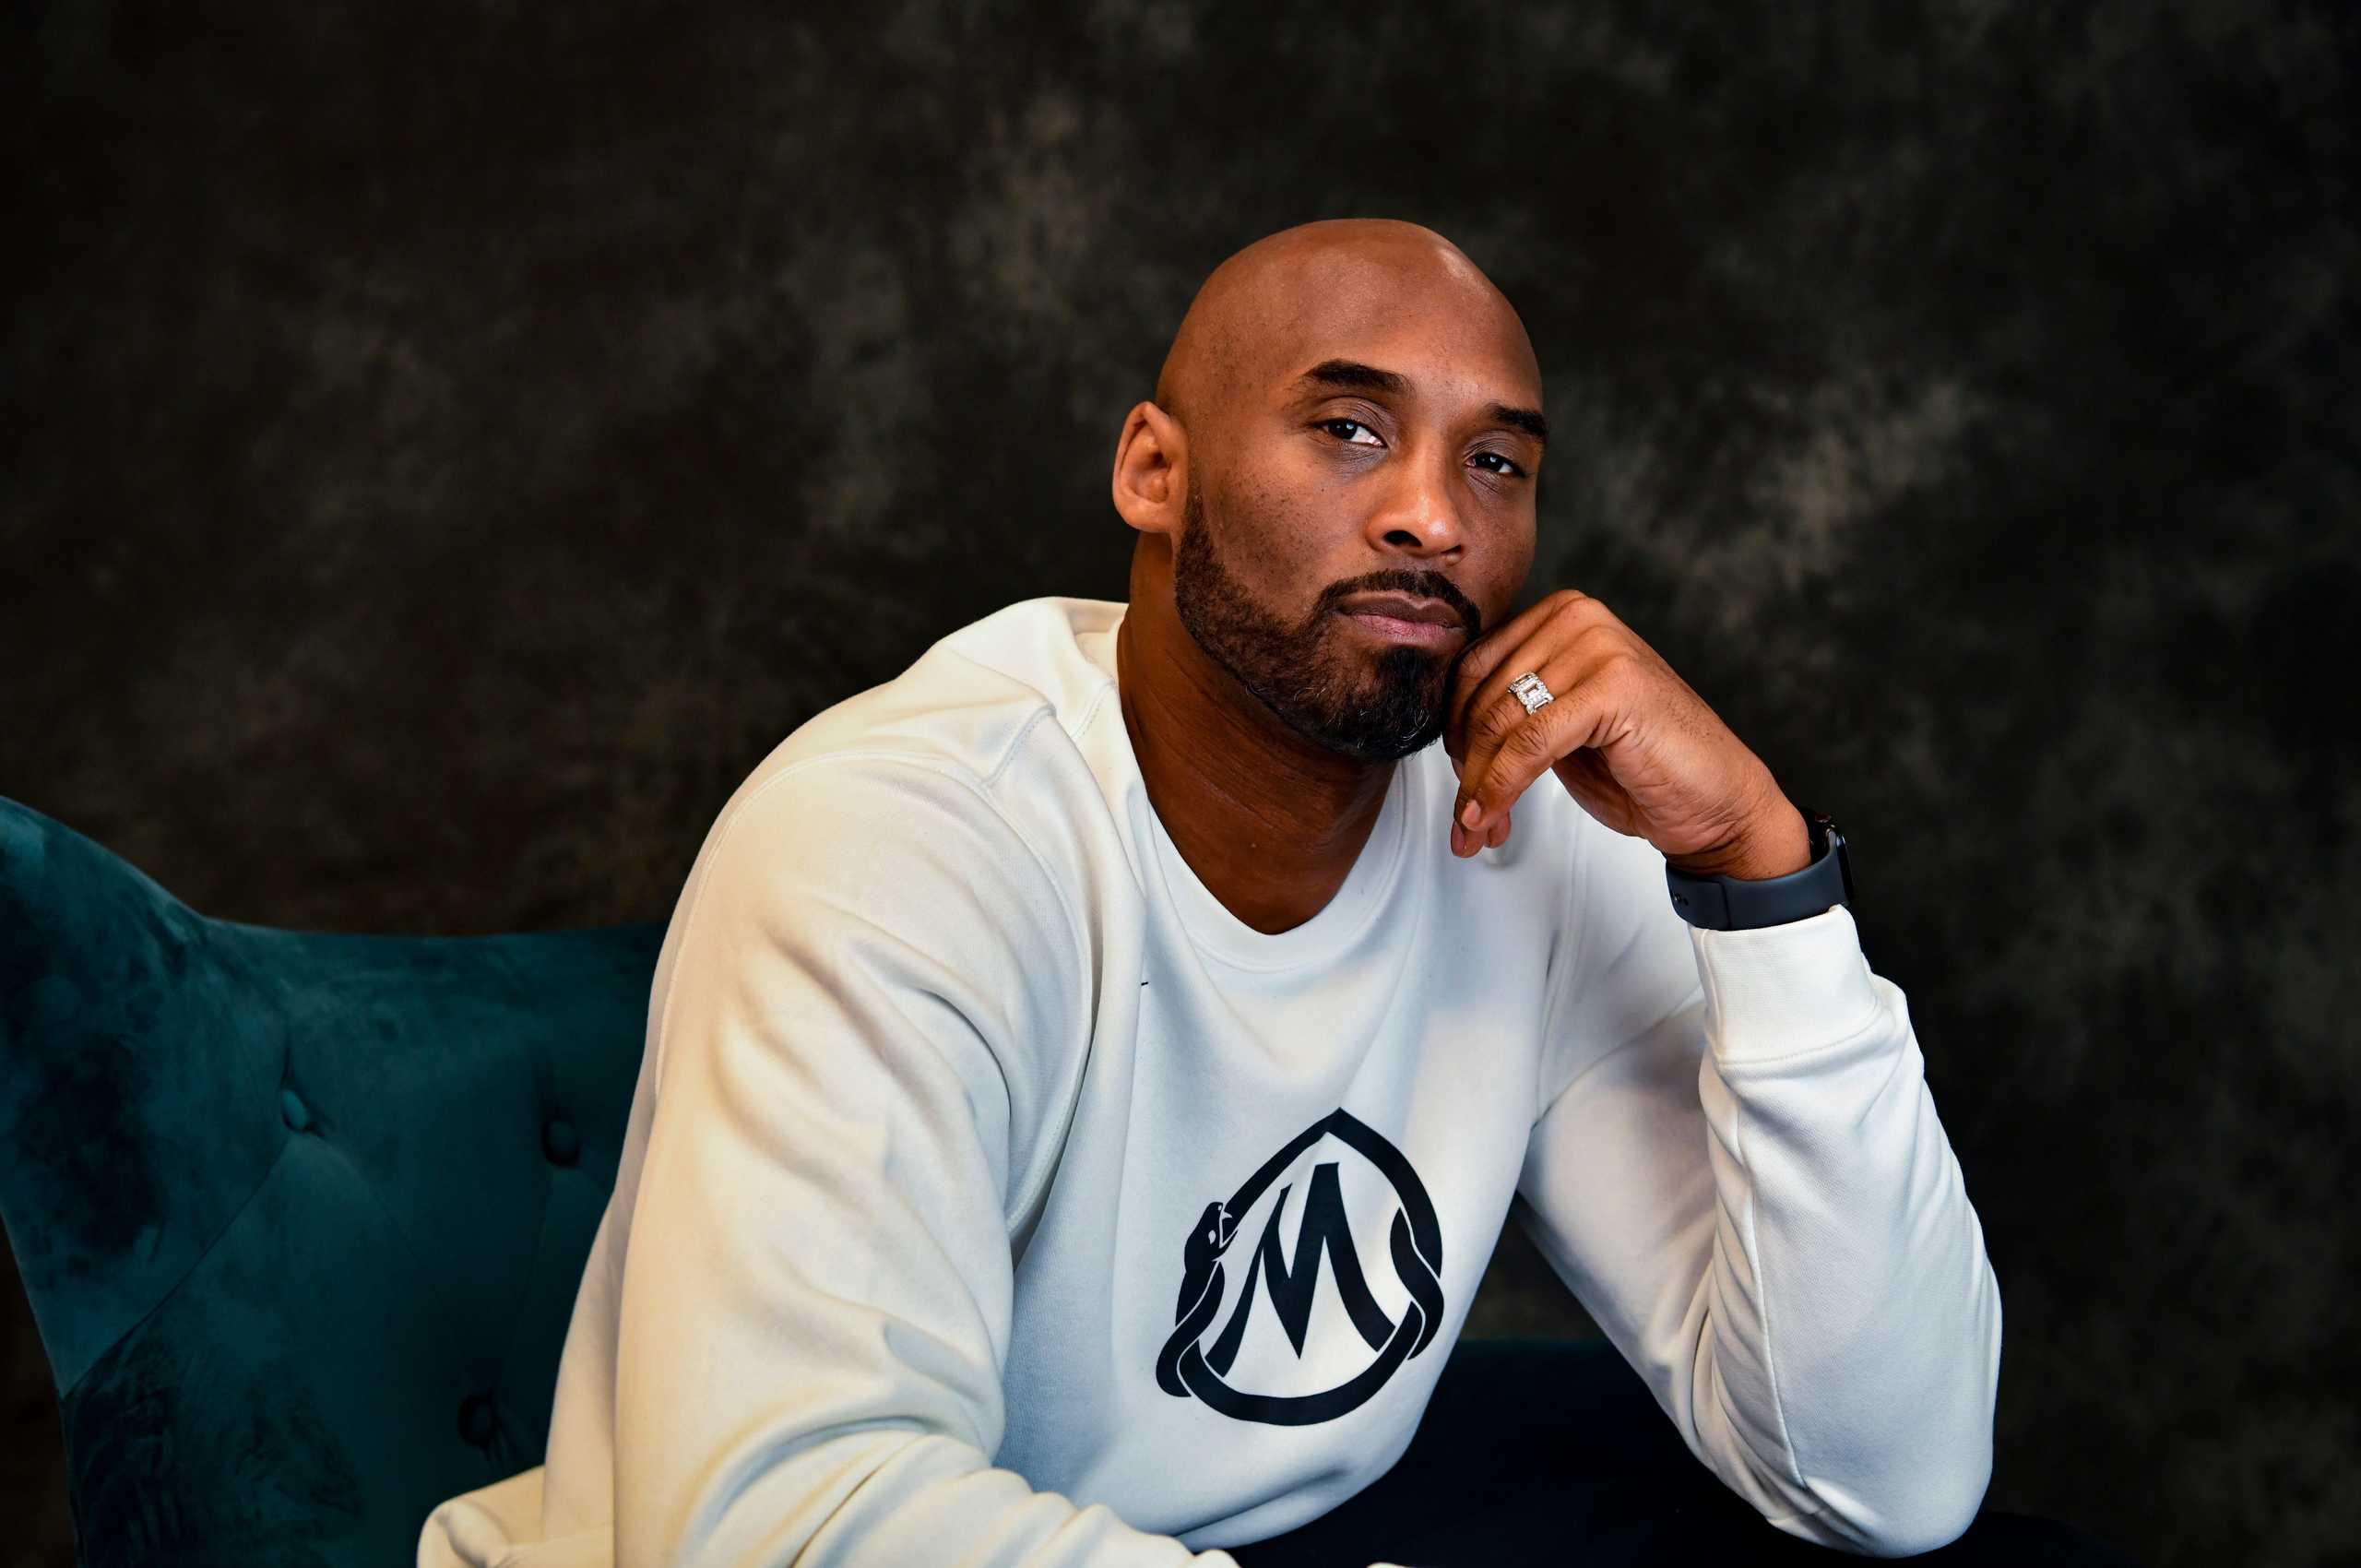 Kobe Bryant 4K HD Wallpapers - Top Free Kobe Bryant 4K HD ...